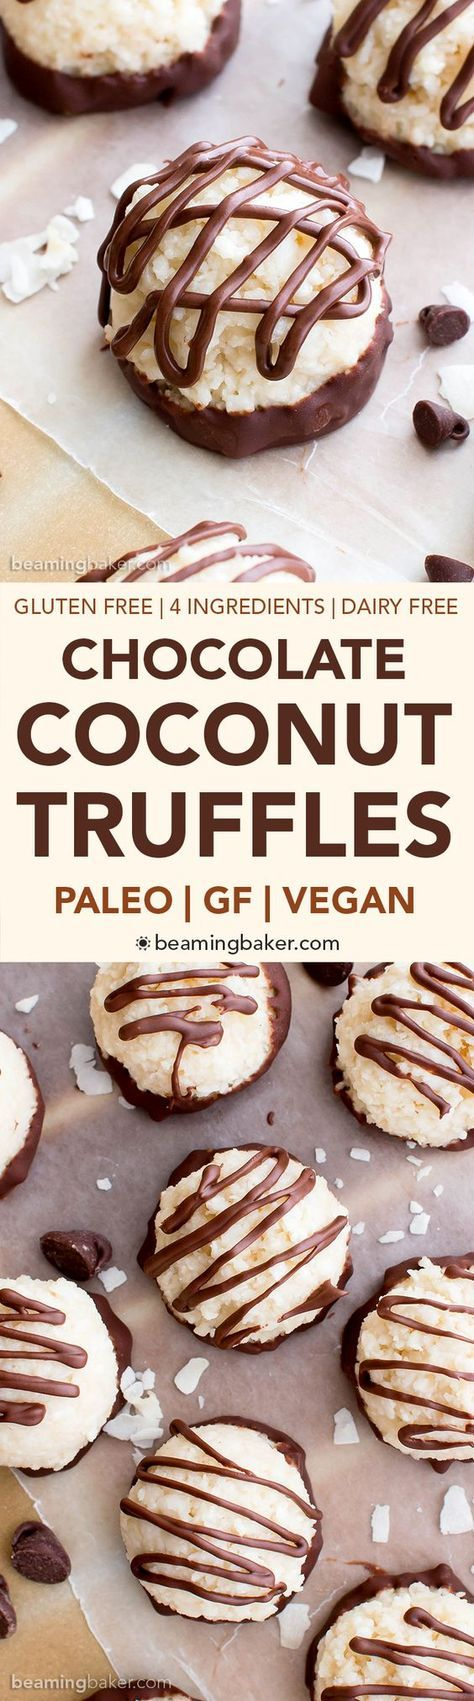 Paleo Vegan Chocolate Coconut Truffles (Gluten Free, Vegan, Paleo, Dairy-Free)   Recipe